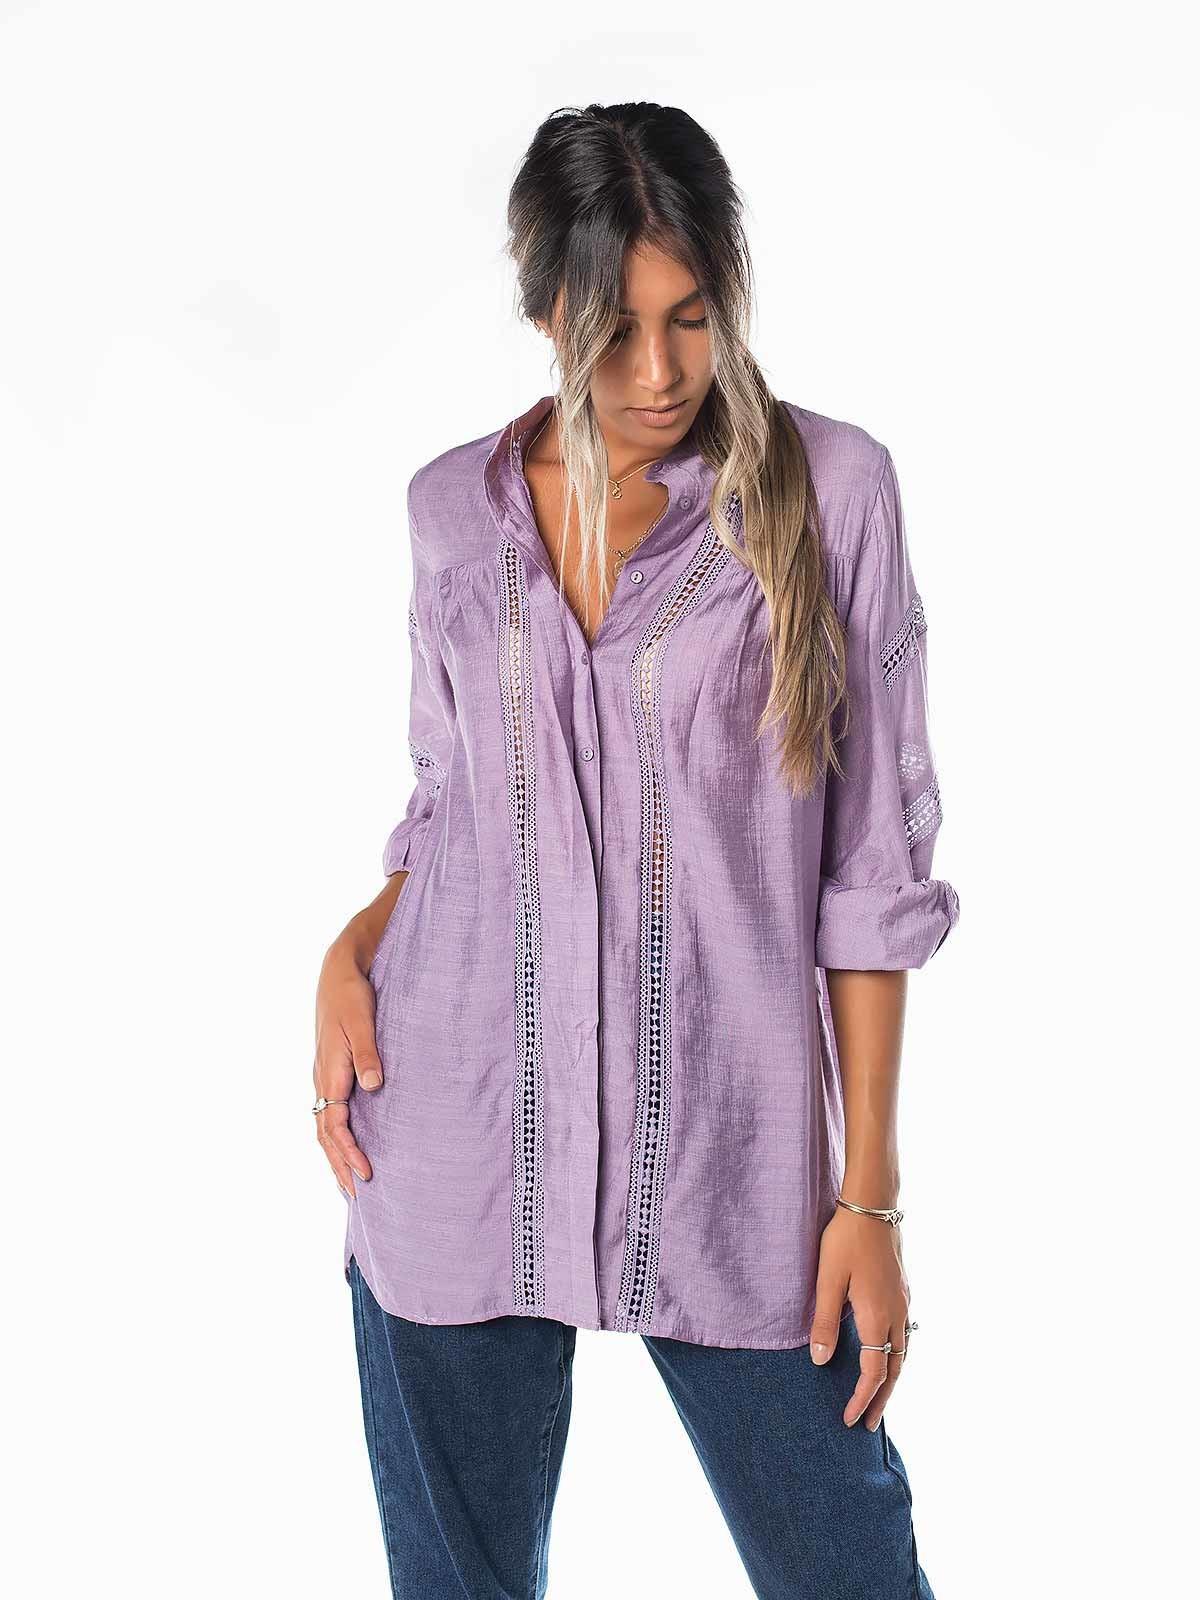 Camisa manga comprida crochet